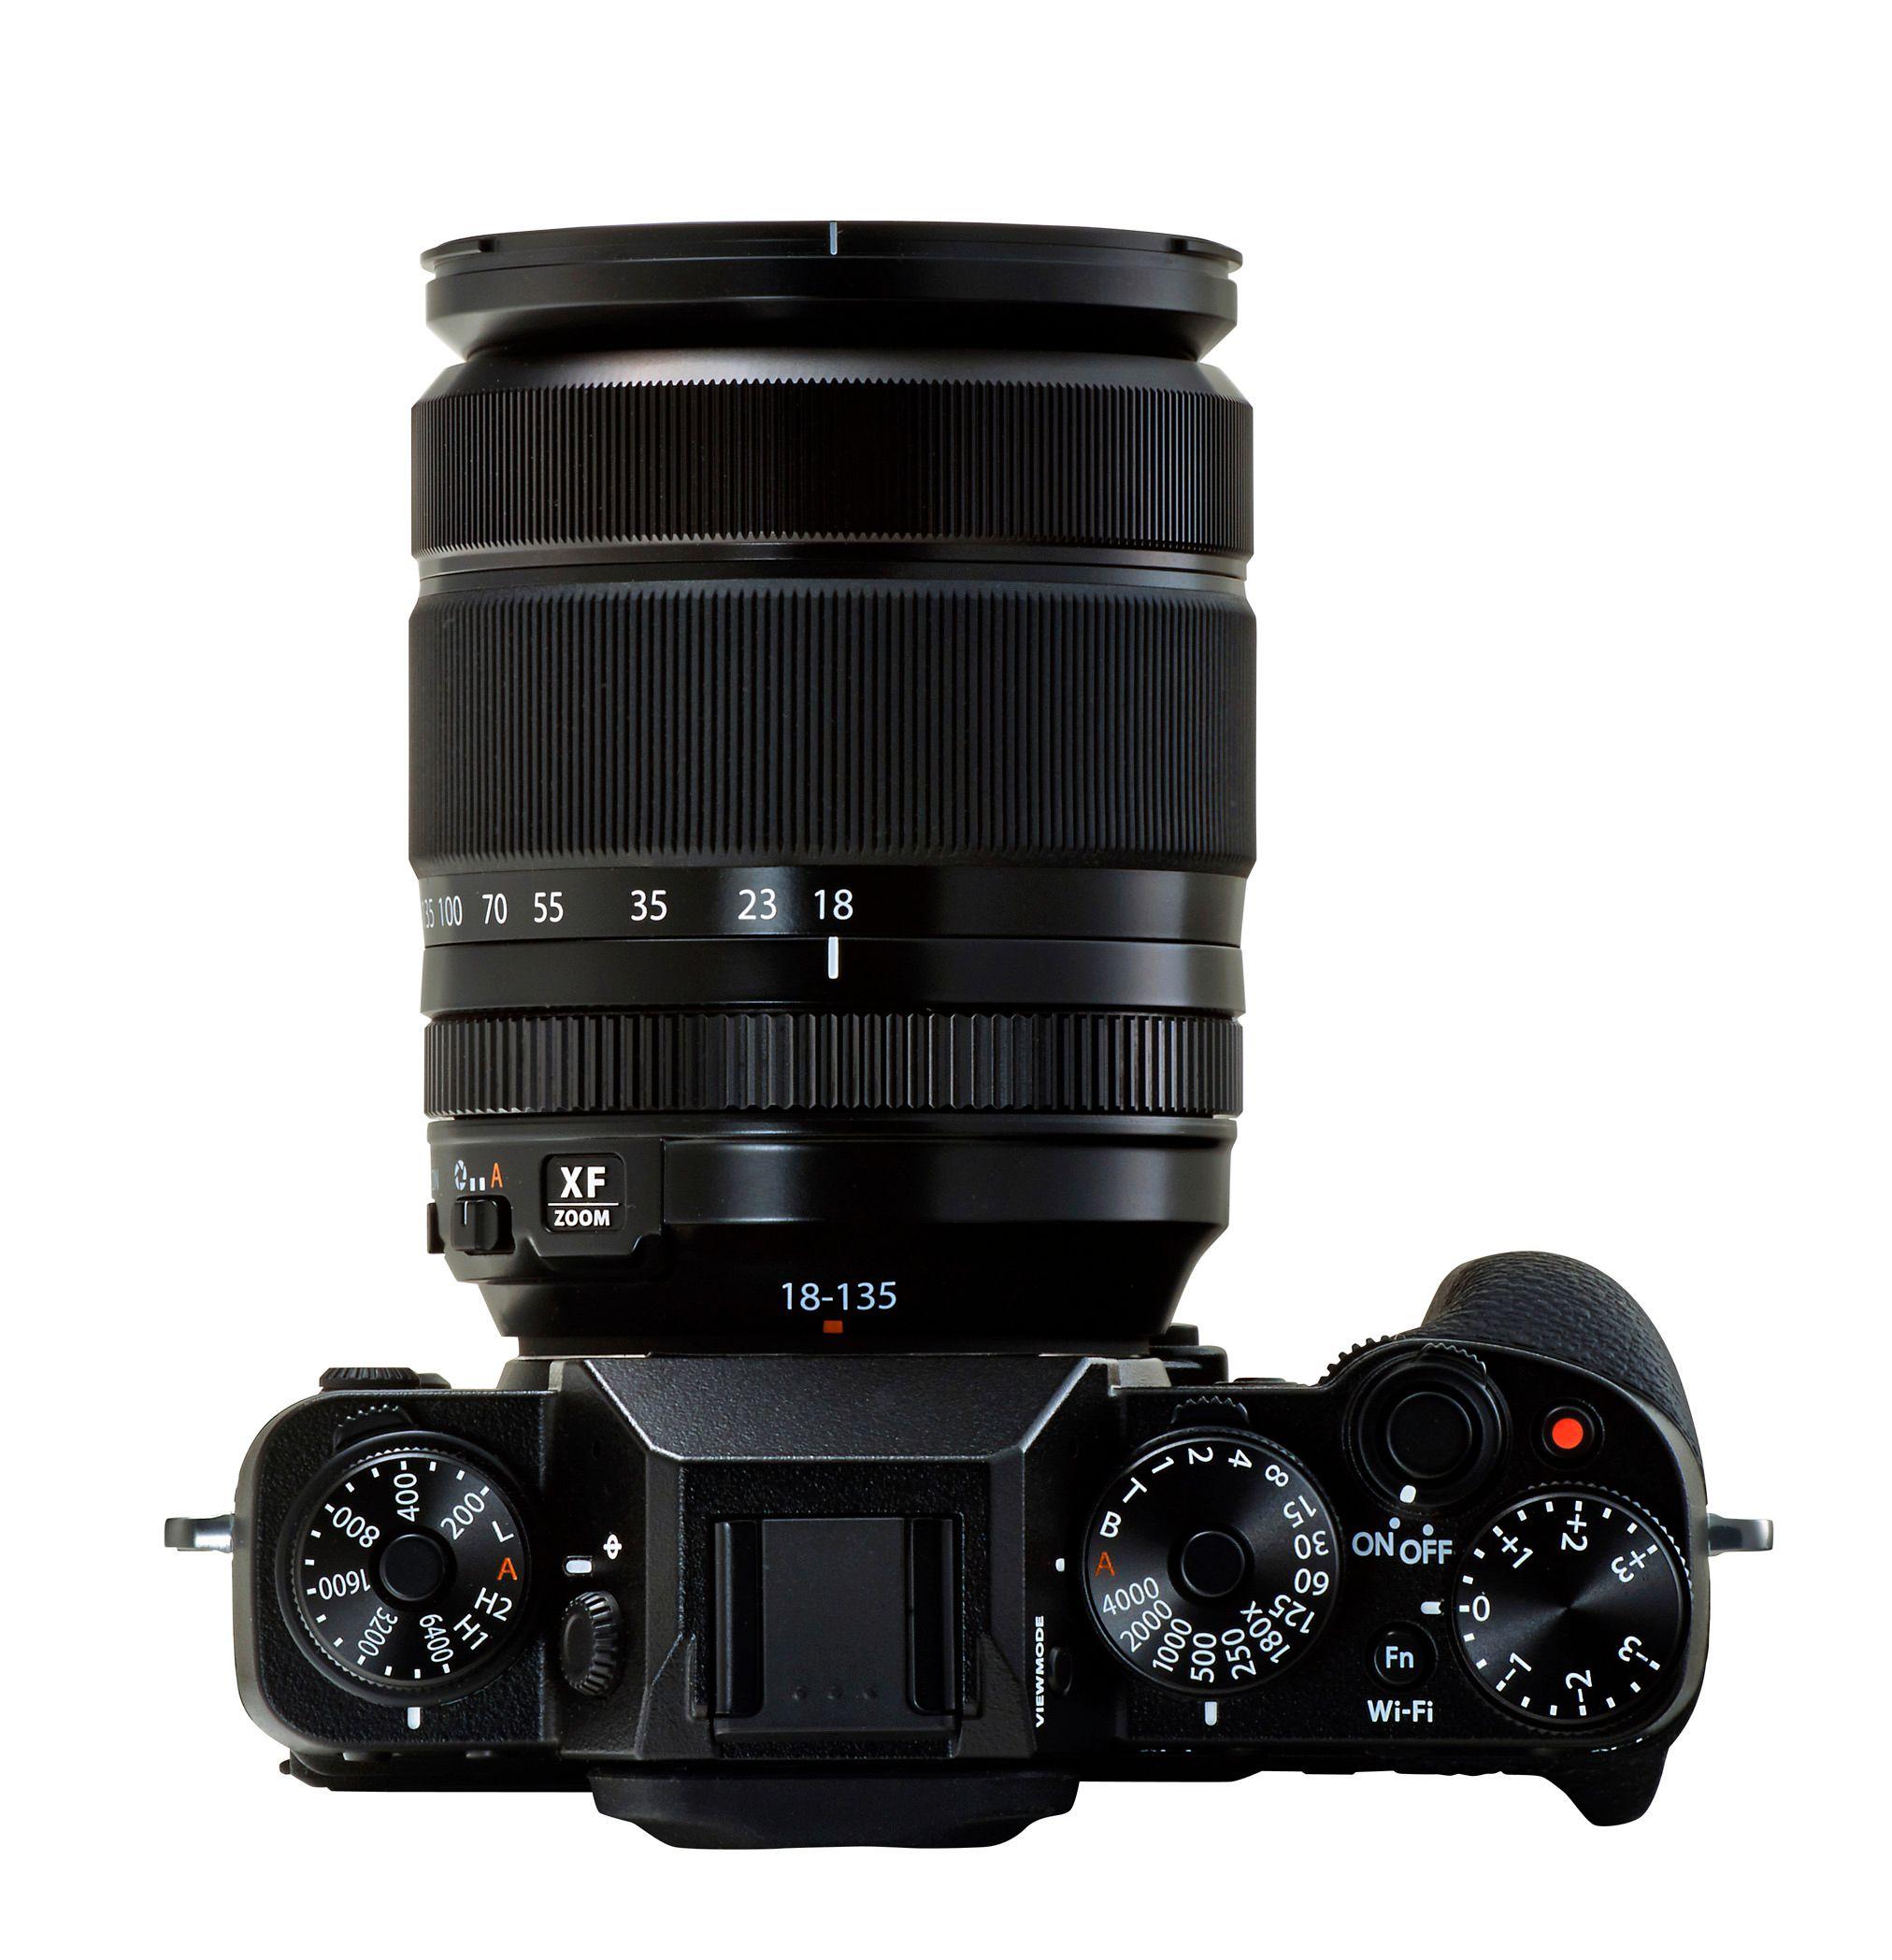 X-T1 med 18-135mm påmontert.Foto: Fujifilm